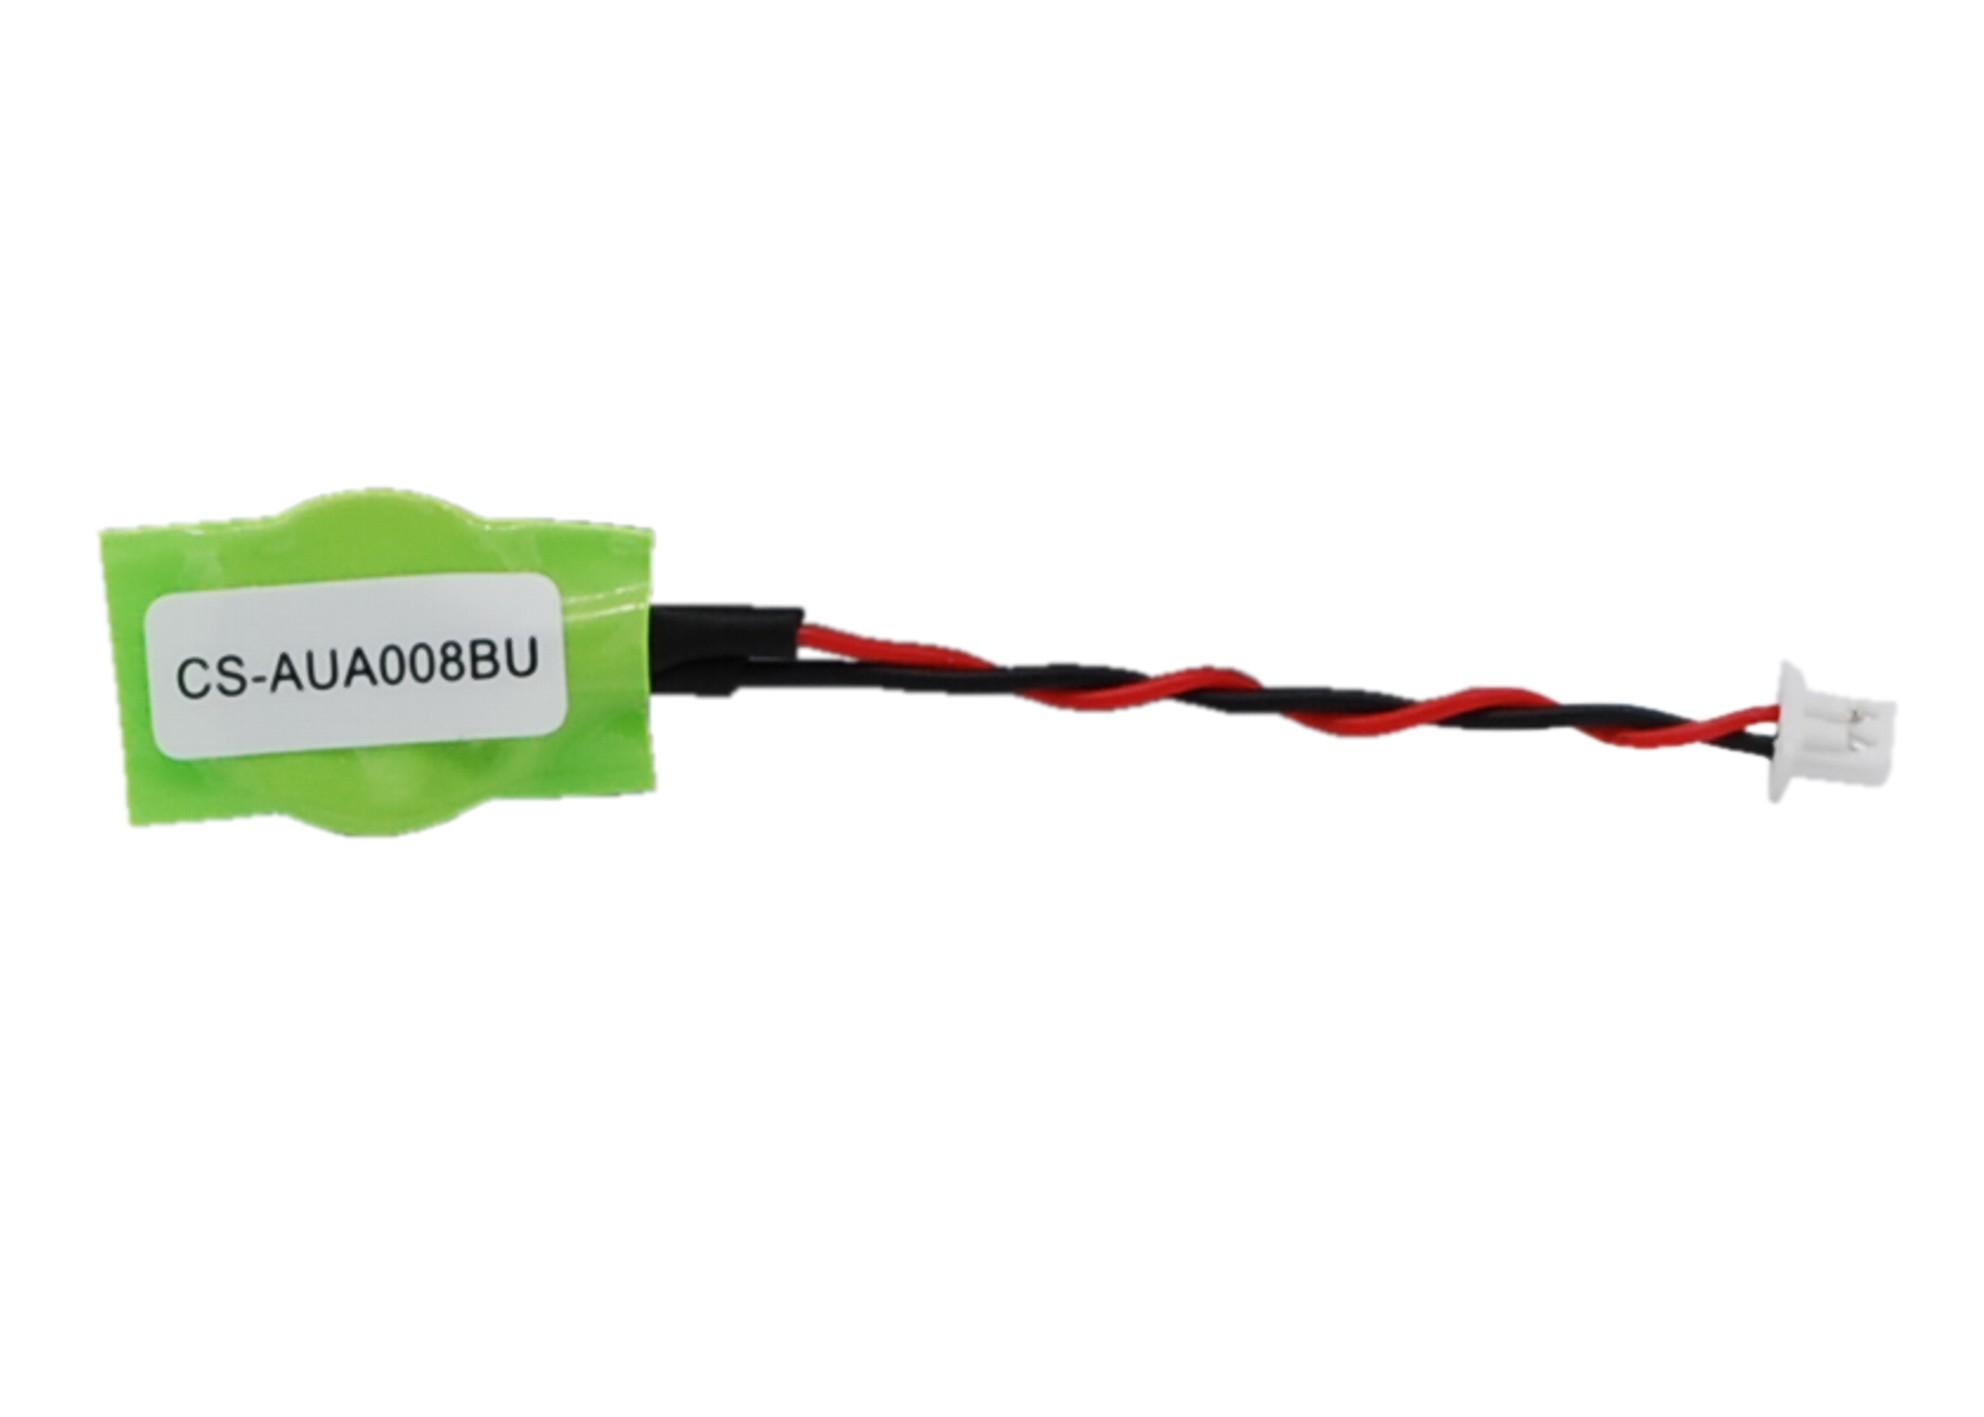 Cameron Sino baterie cmos pro ASUS Eee PC 1005HAB 3V Li-ion 40mAh zelená - neoriginální